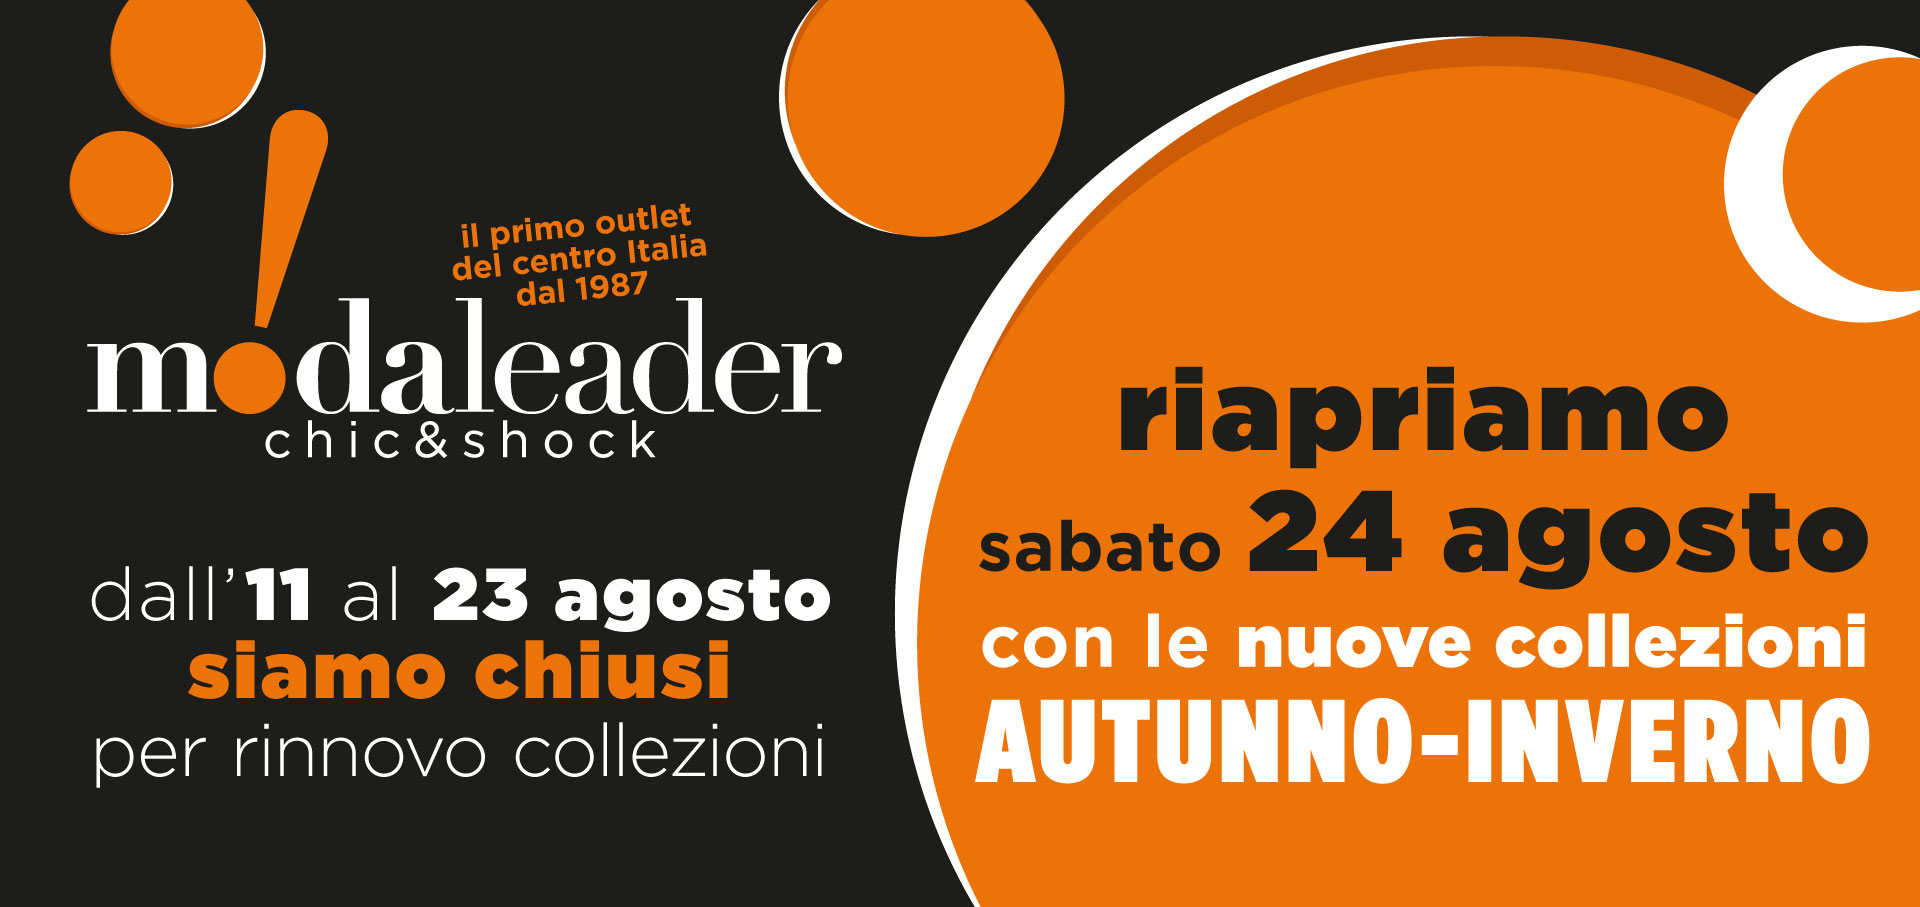 banner-sito-modaleader-autunno